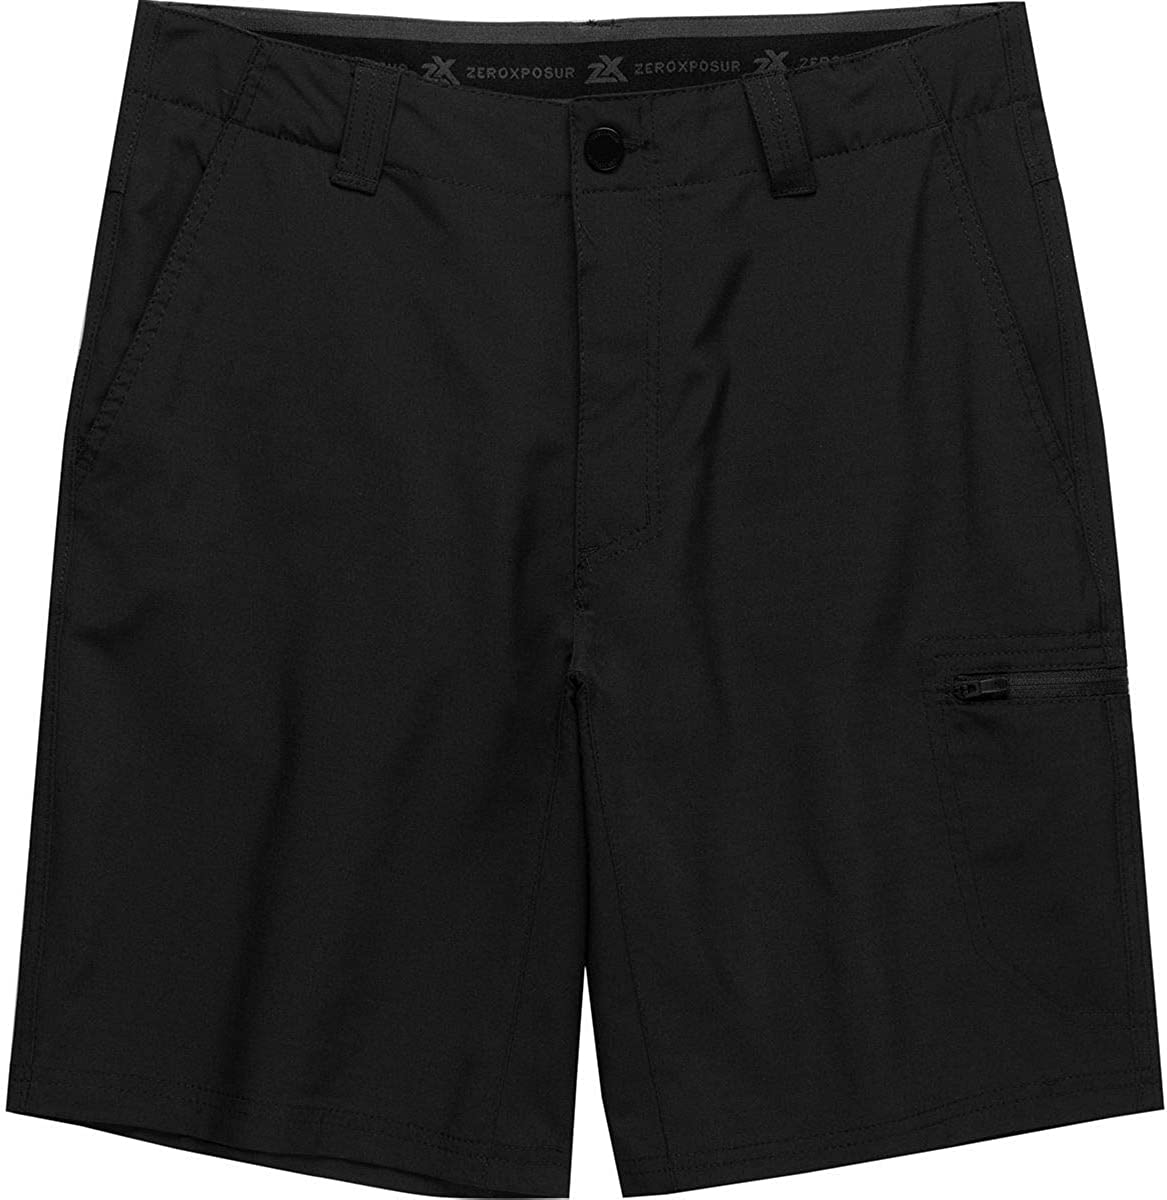 ZeroXposur Men's Travel Flex Stretch Lightweight Shorts